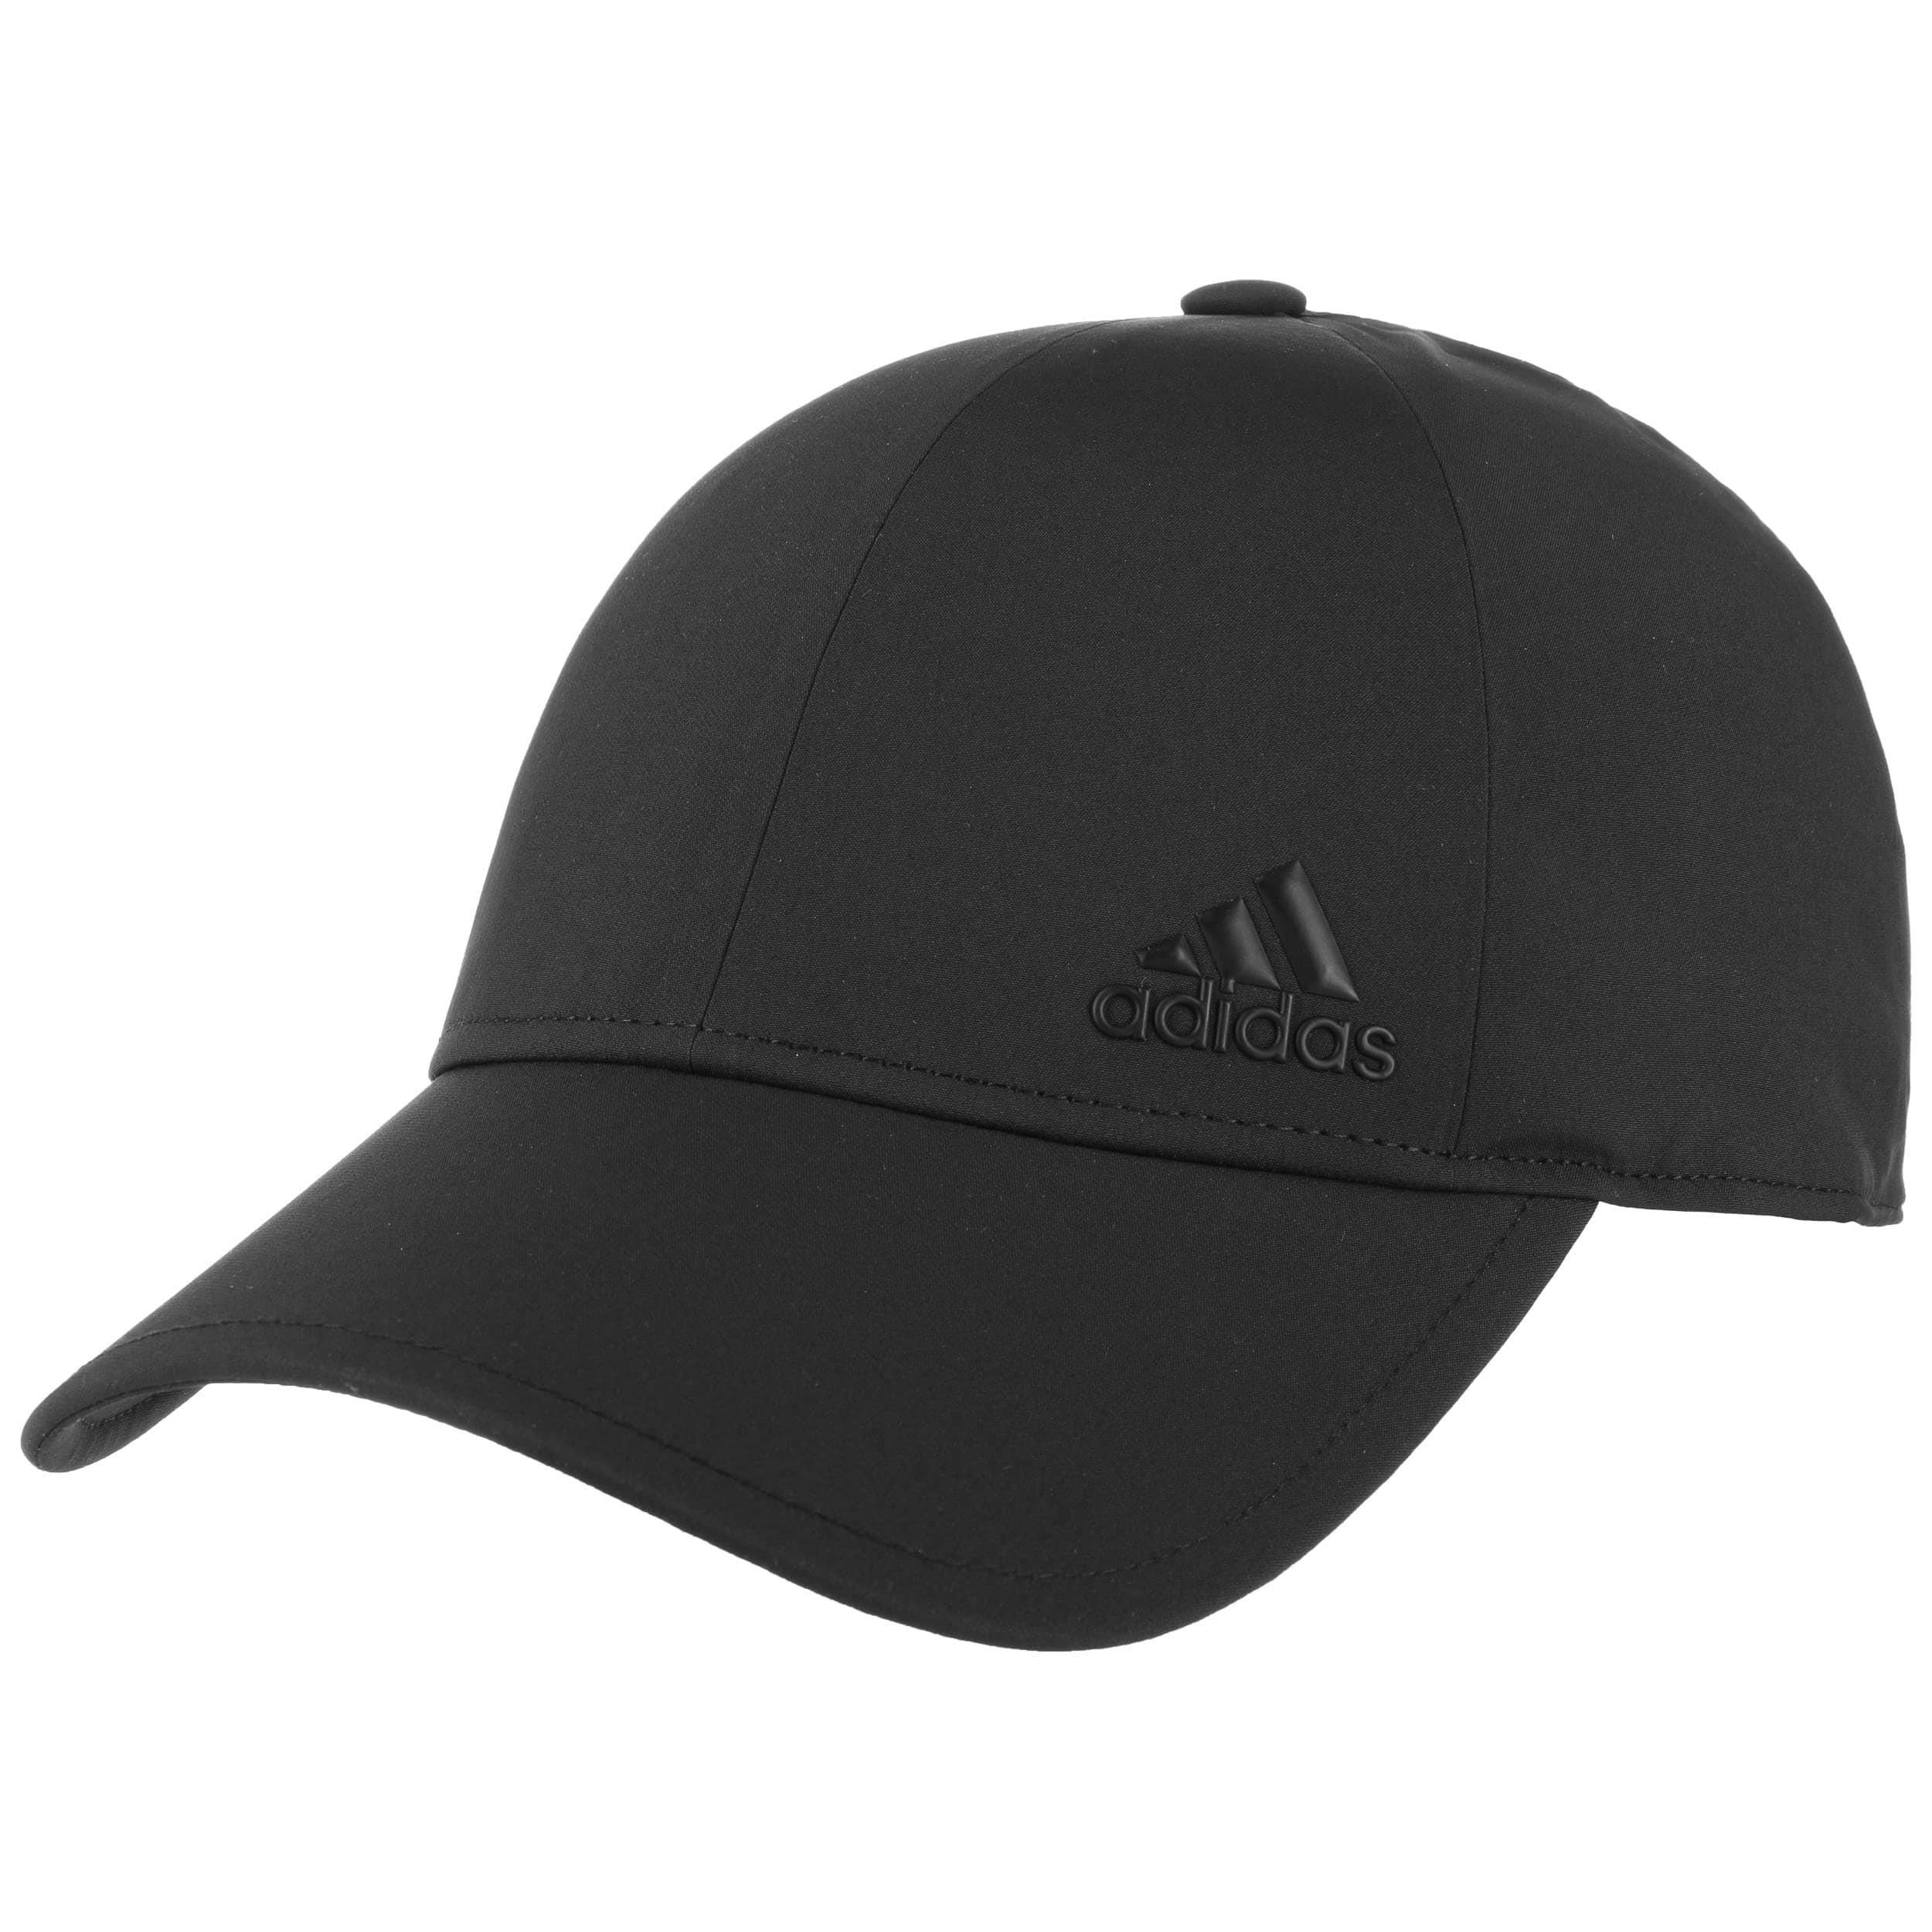 4ccd63ec741 ... Bonded Cap by adidas - black 5 ...